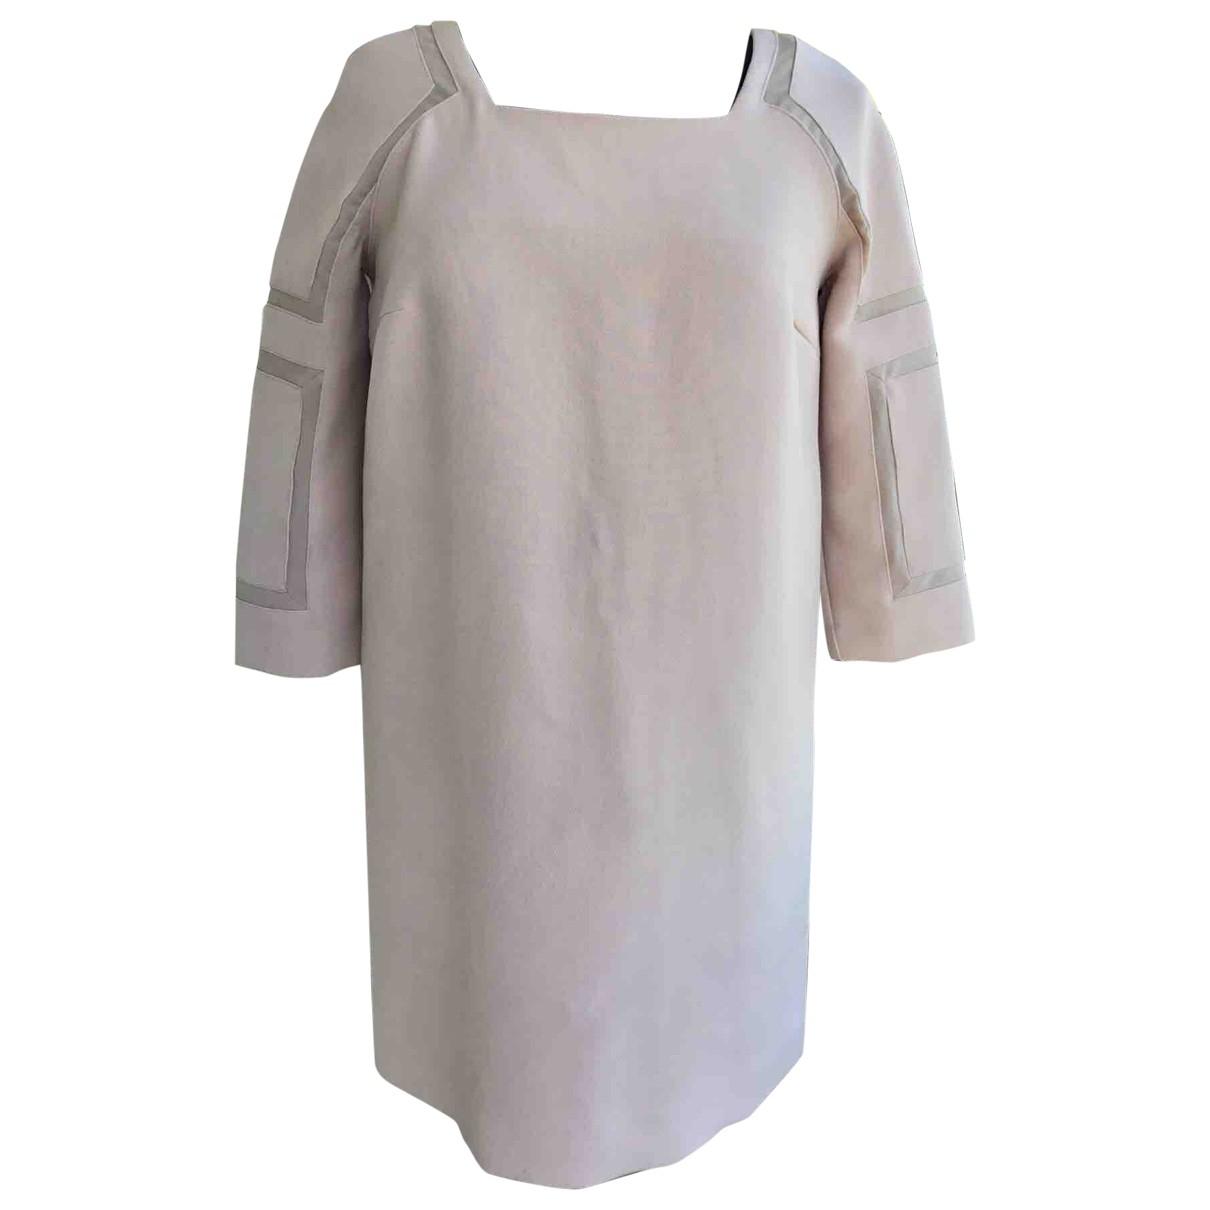 Bel Air \N Beige dress for Women 2 0-5